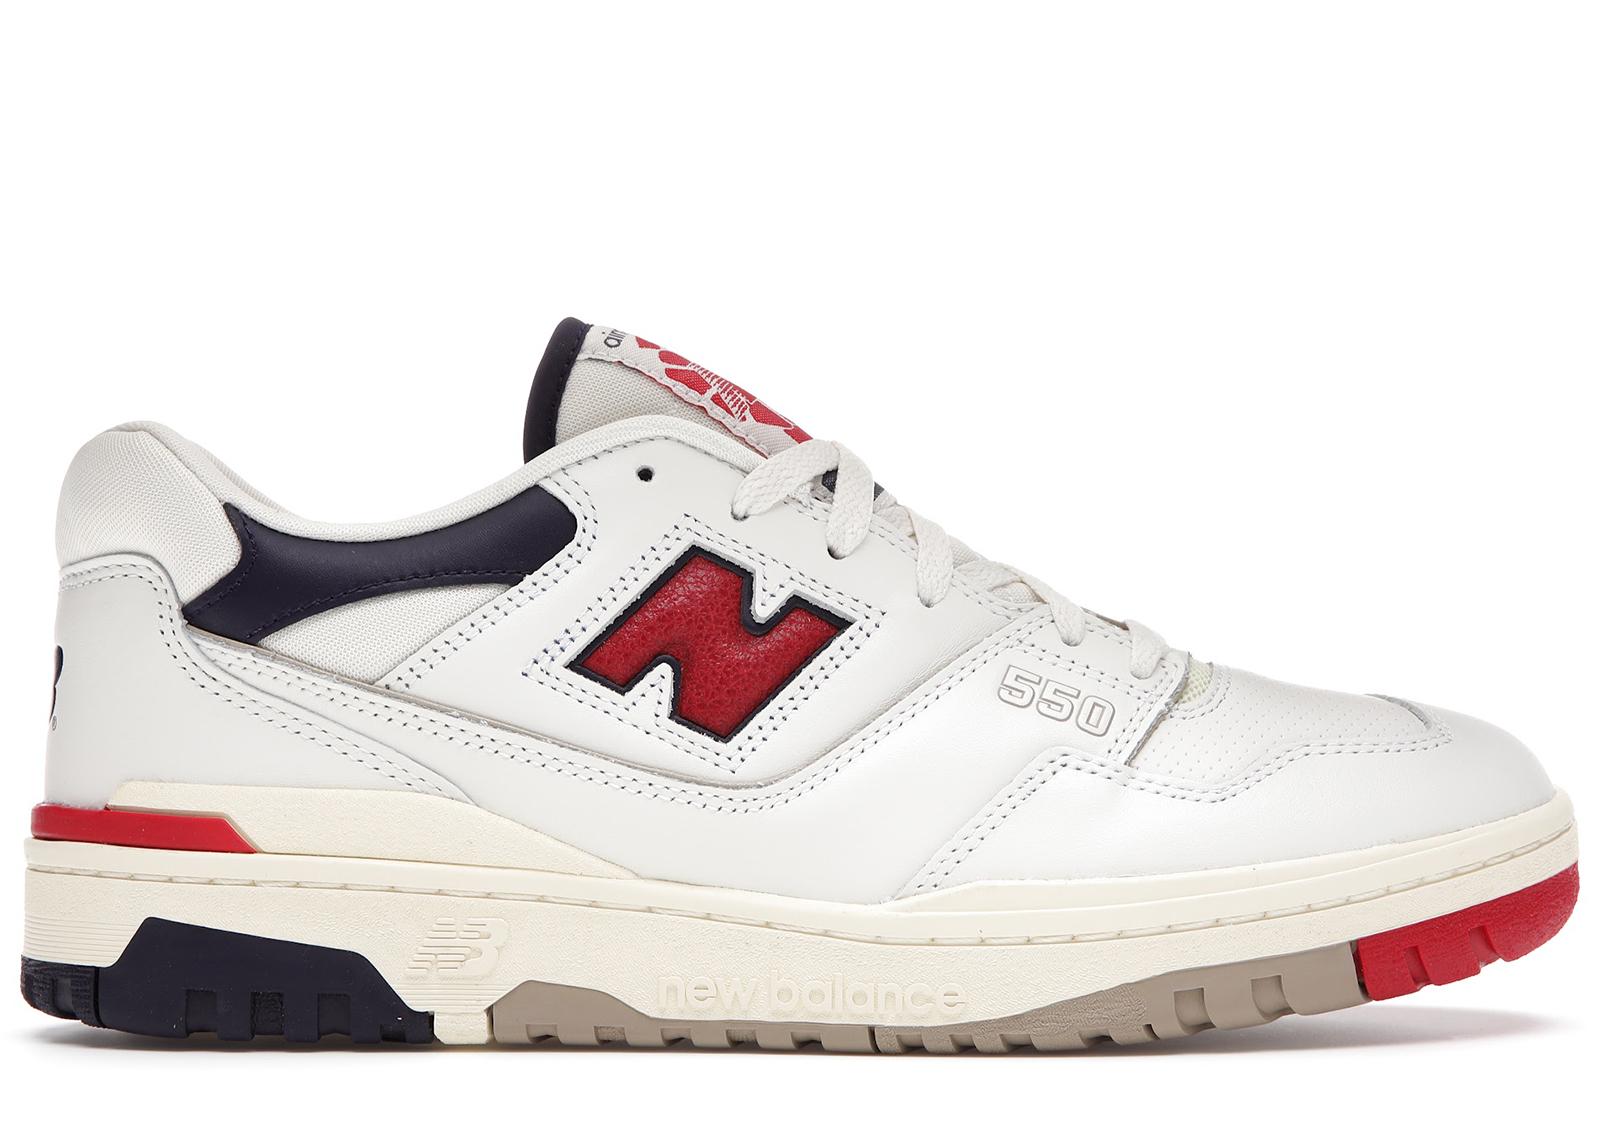 New Balance 550 Aime Leon Dore White Navy Red